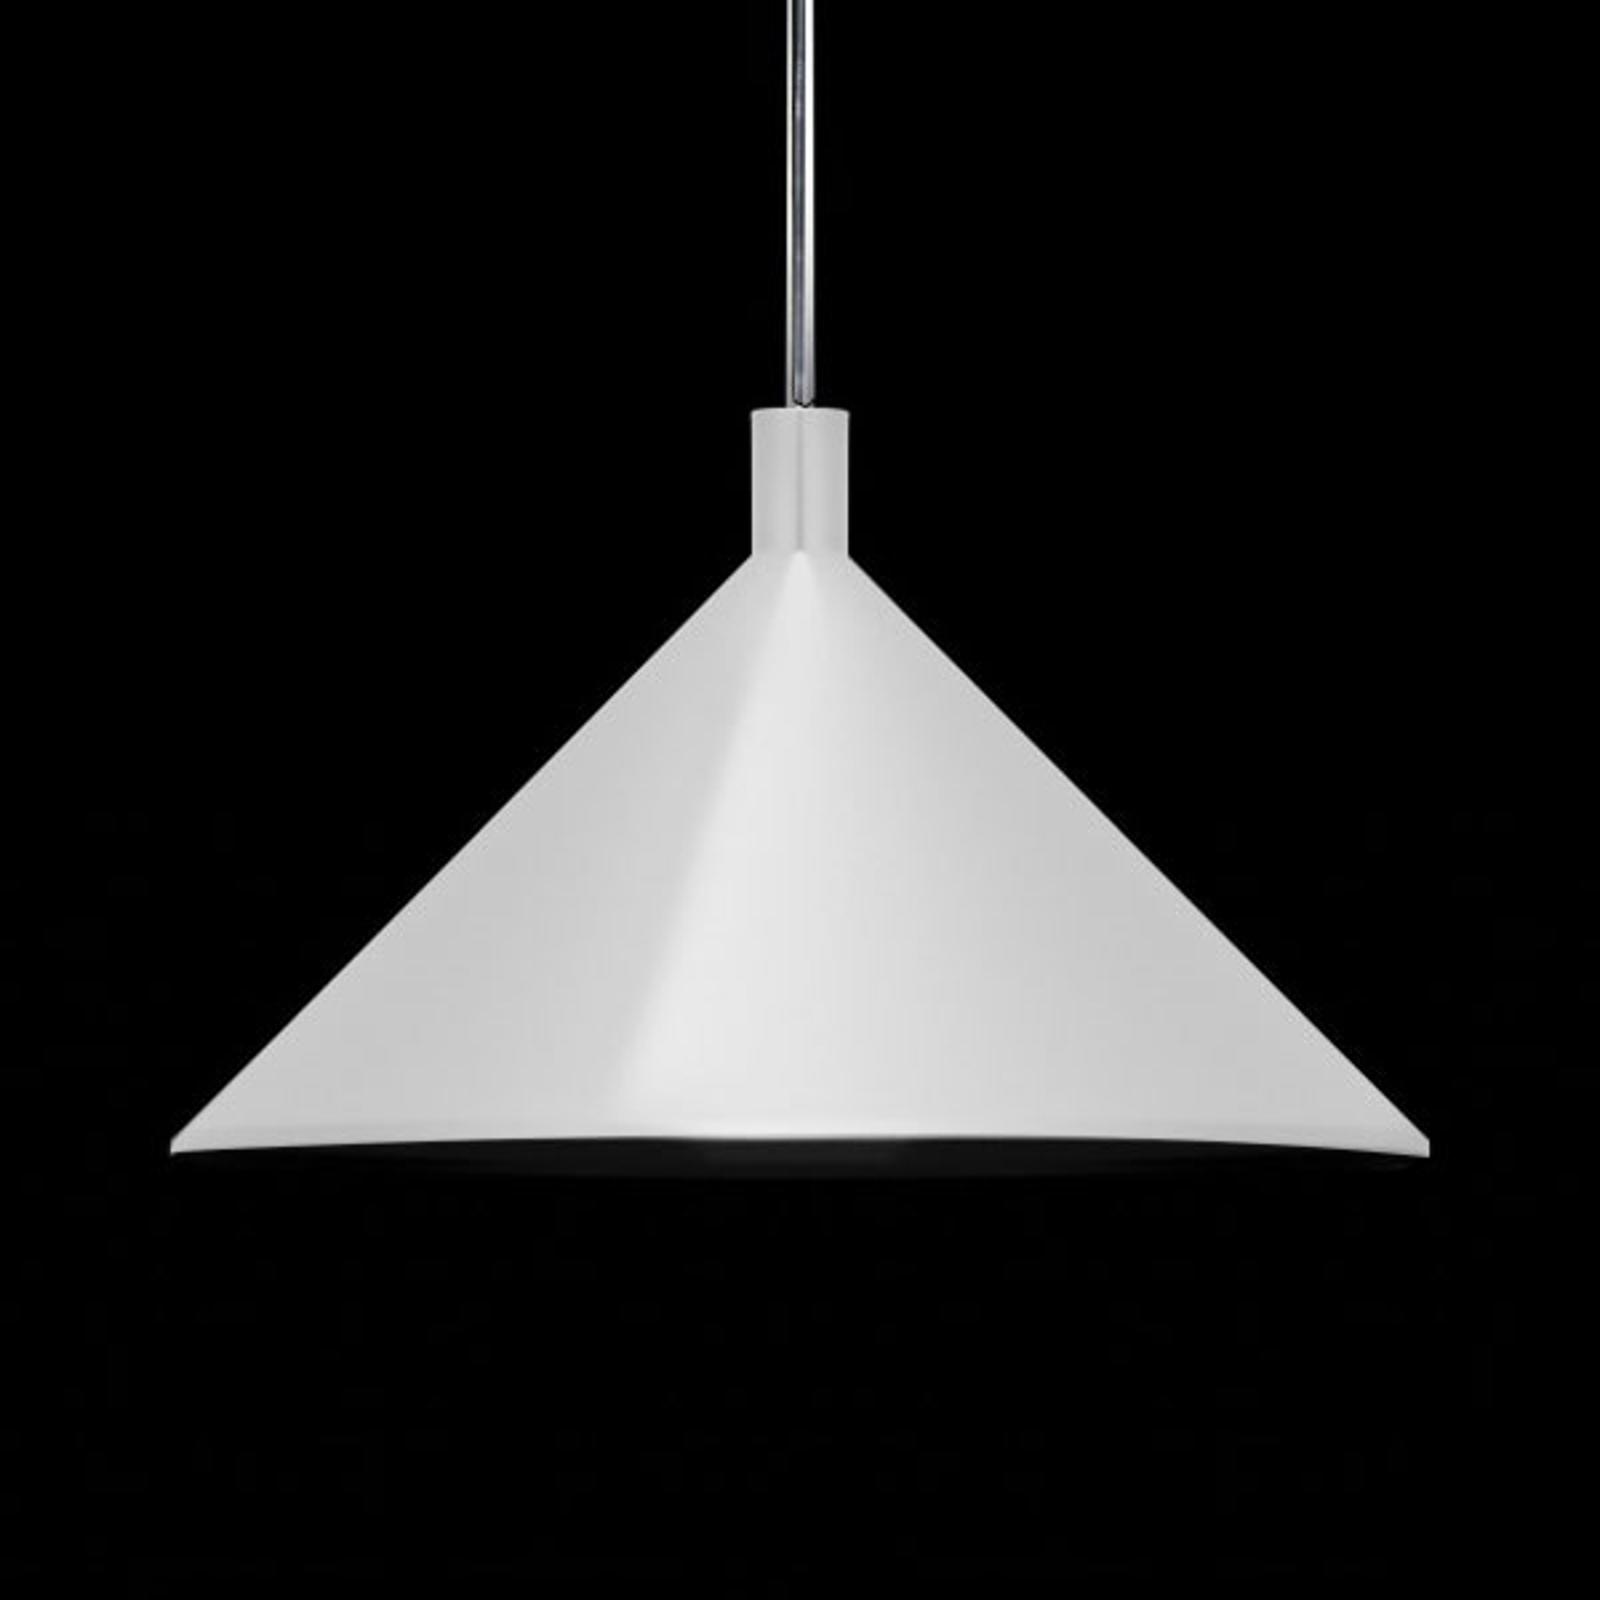 Martinelli Luce Cono hanglamp wit, Ø 30 cm